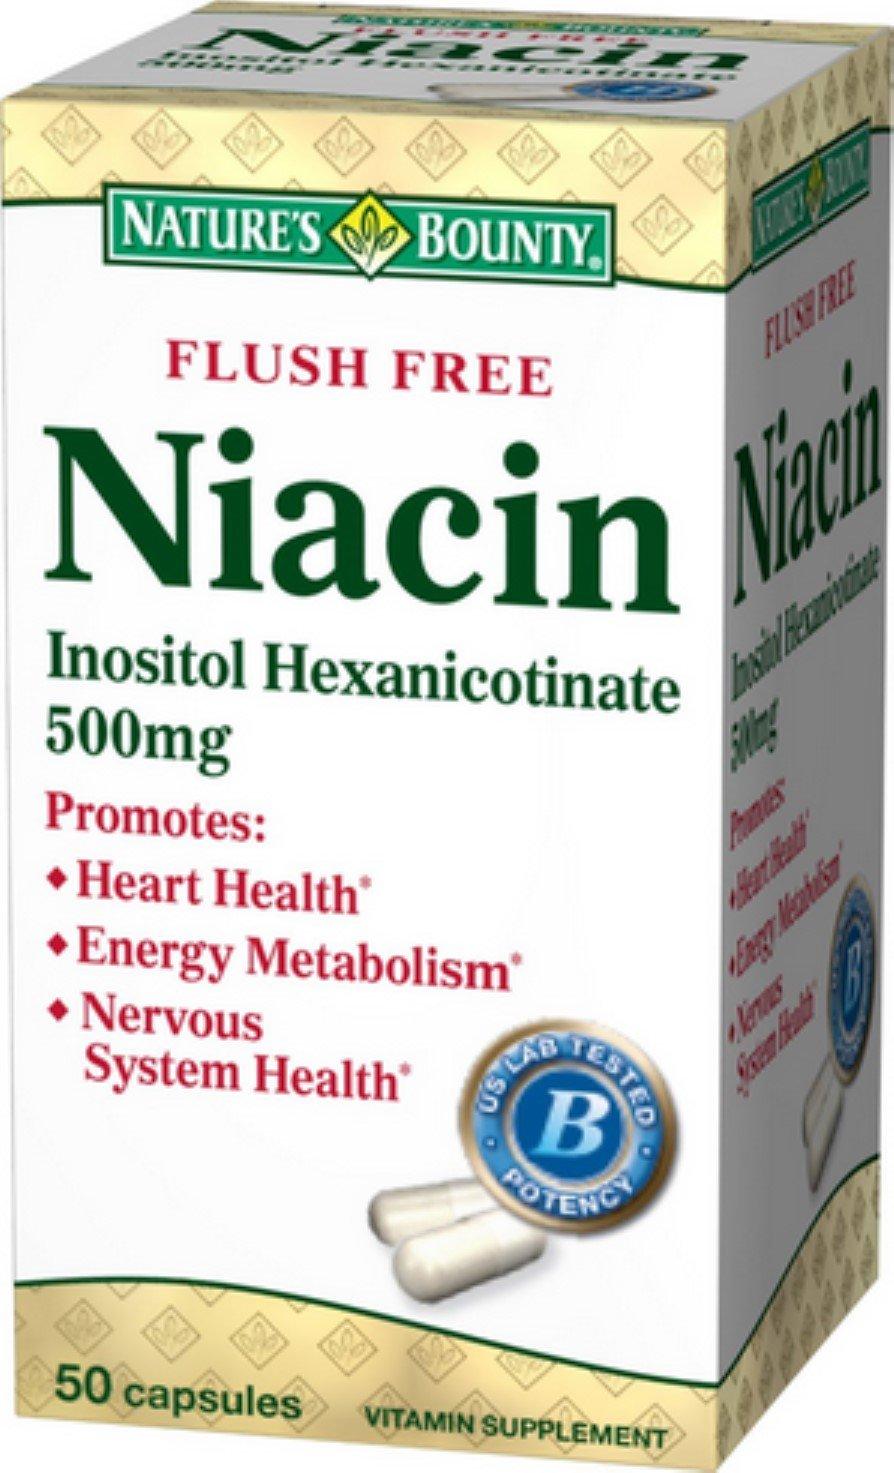 Nature's Bounty Niacin 500 mg Capsules Flush Free 50 ea (Pack of 10)